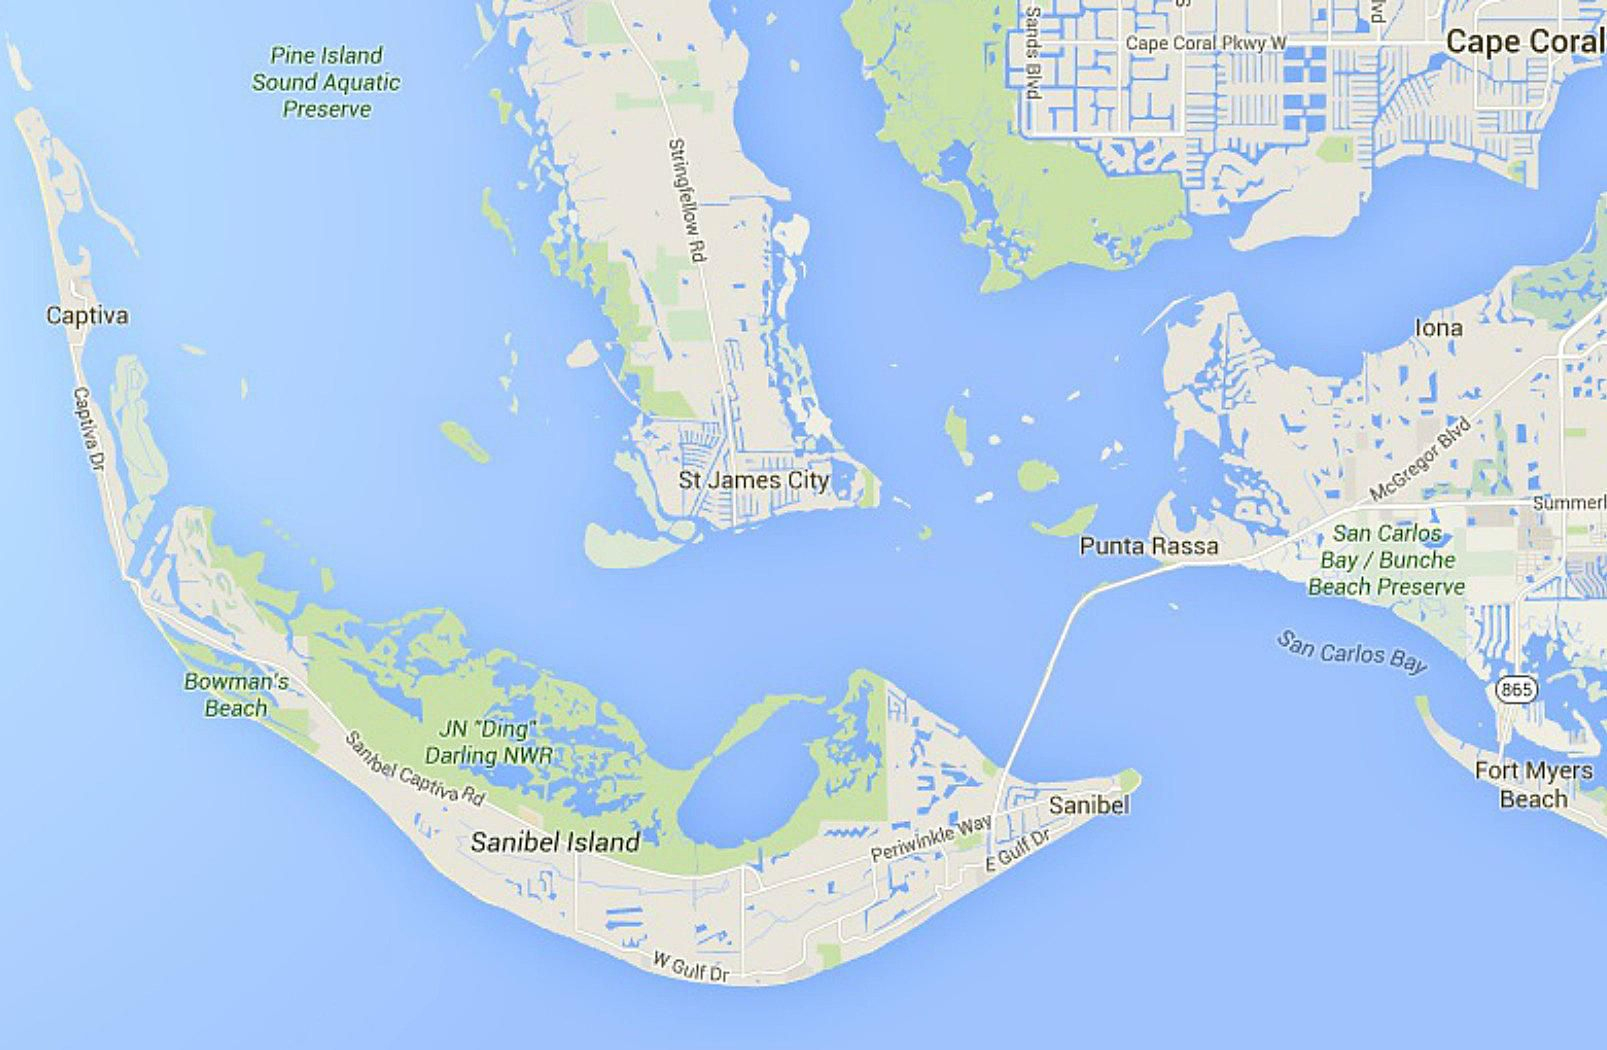 Maps Of Florida: Orlando, Tampa, Miami, Keys, And More - Sanibel Florida Map